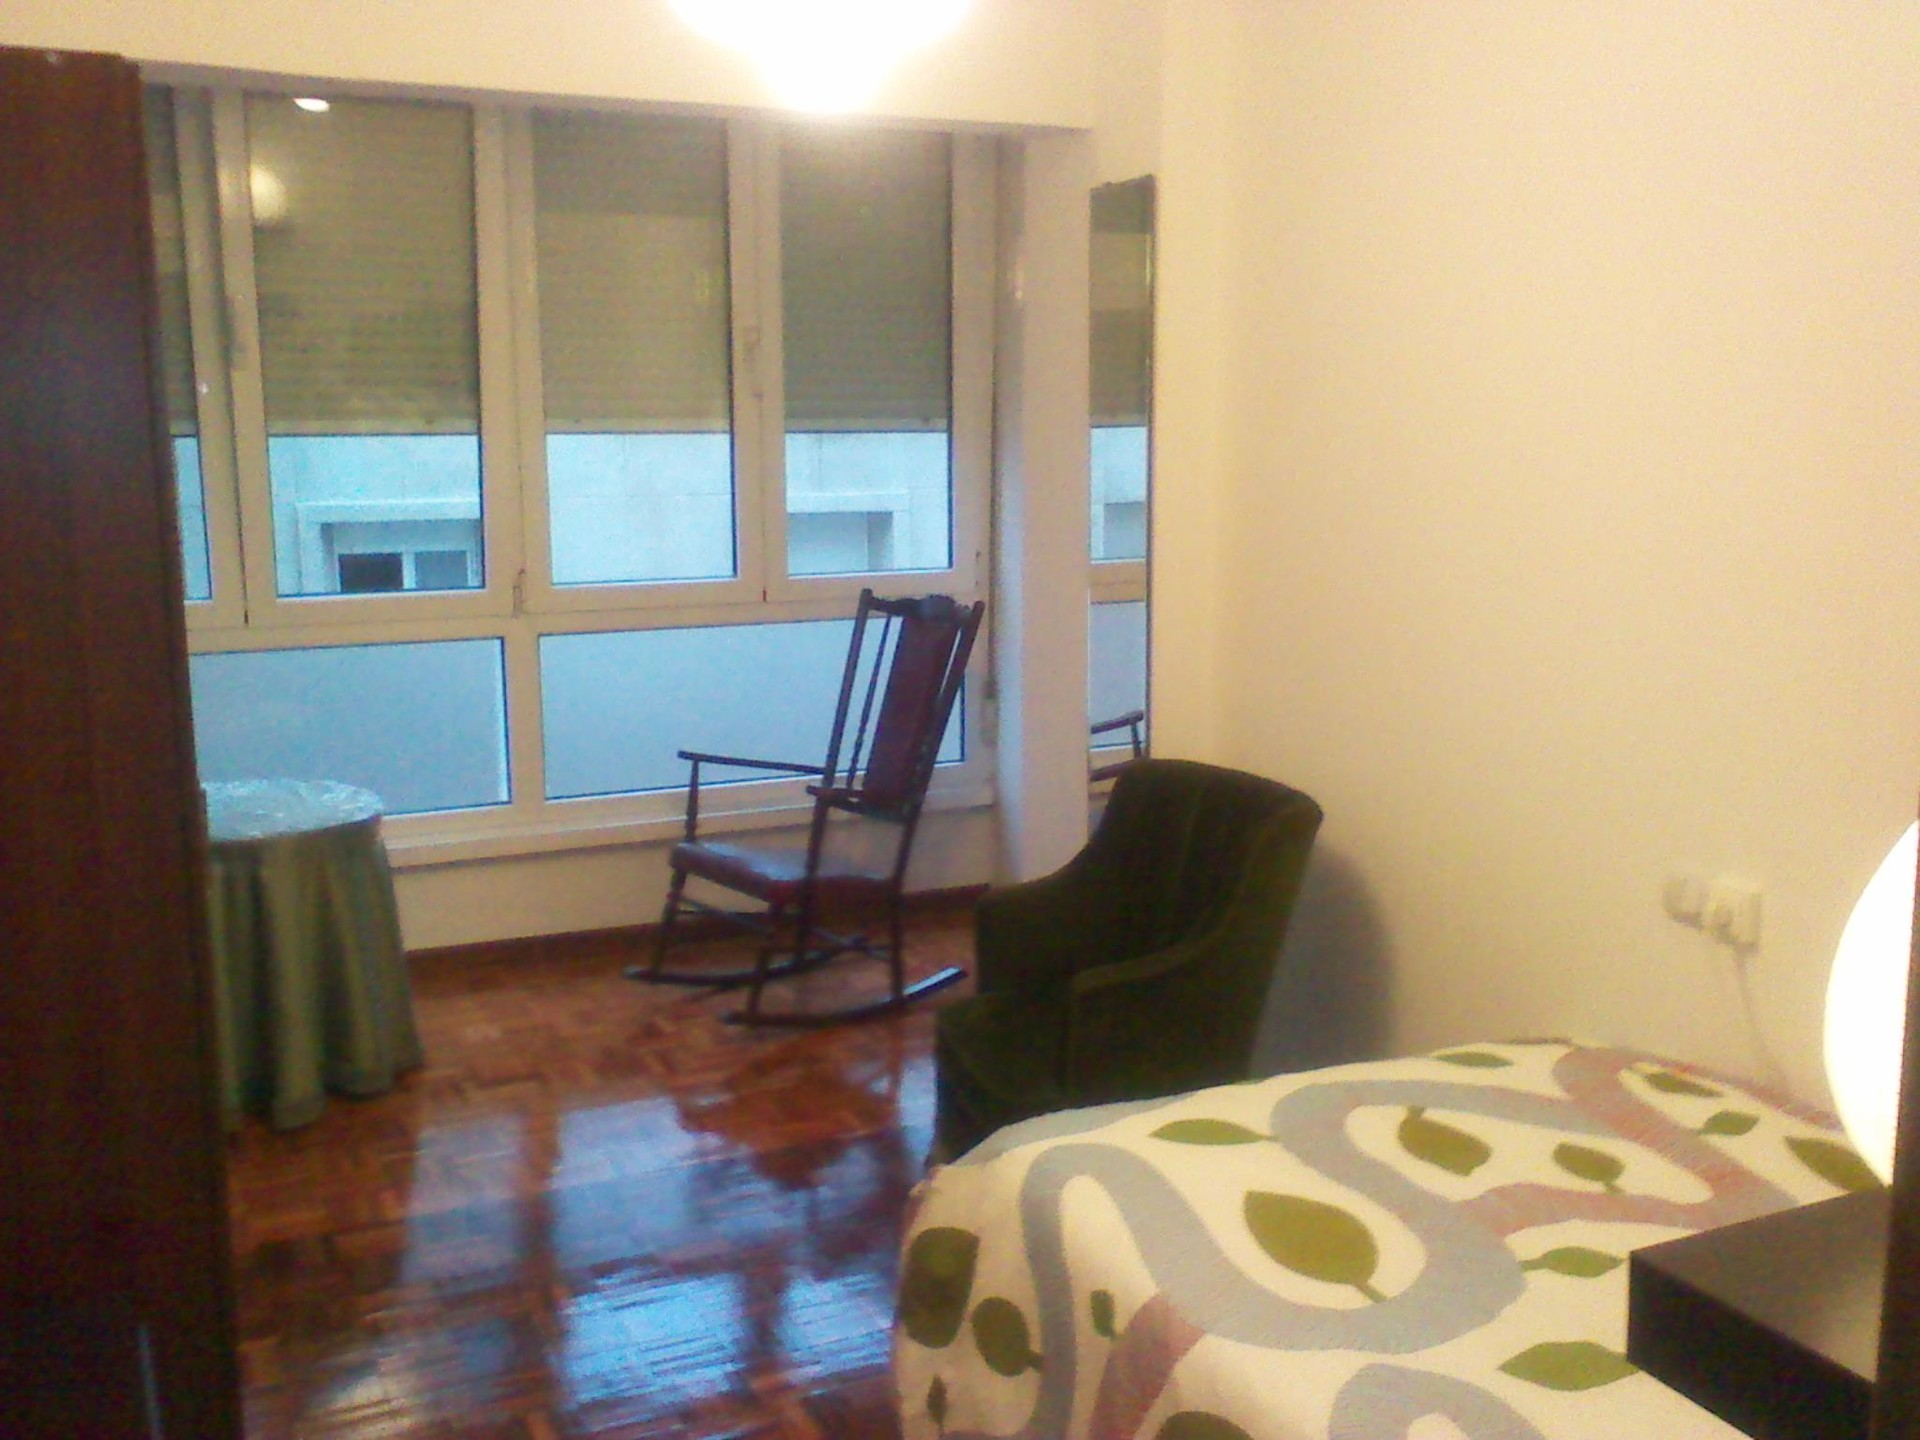 pisos alquiler 4 habitaciones gijon